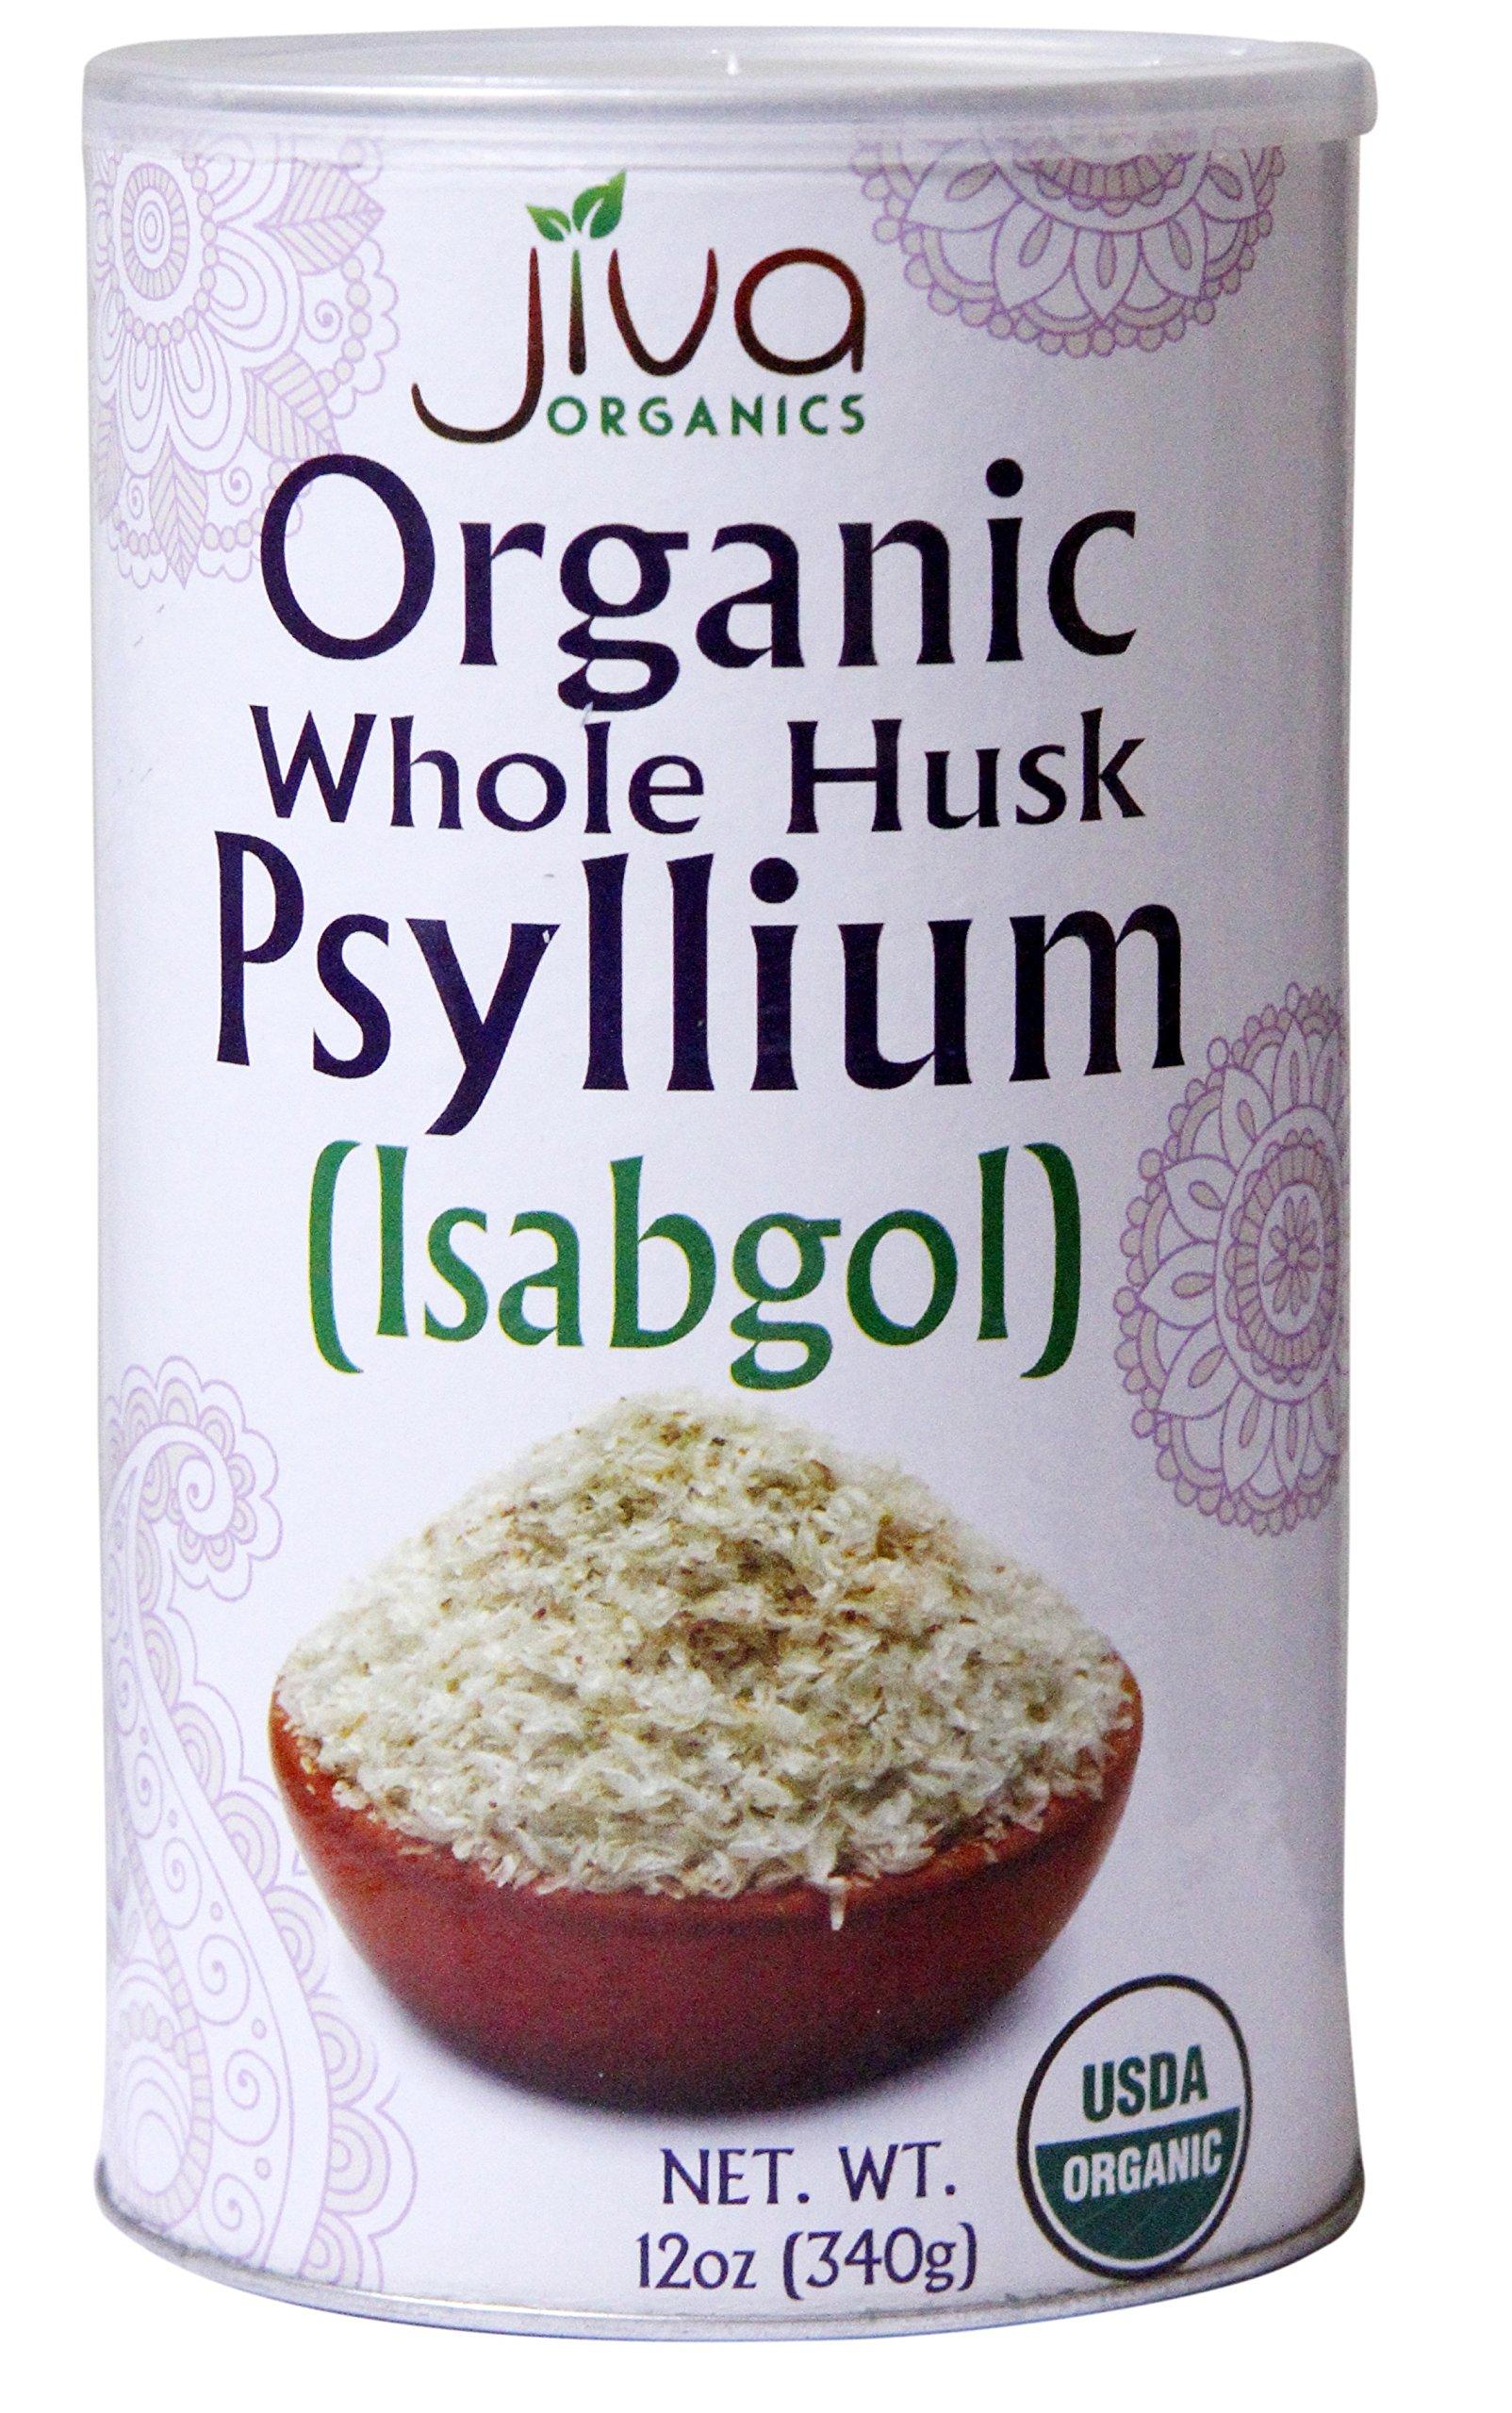 Jiva USDA ORGANIC Whole Husk Psyllium (Isabgol) 12-Ounce Can